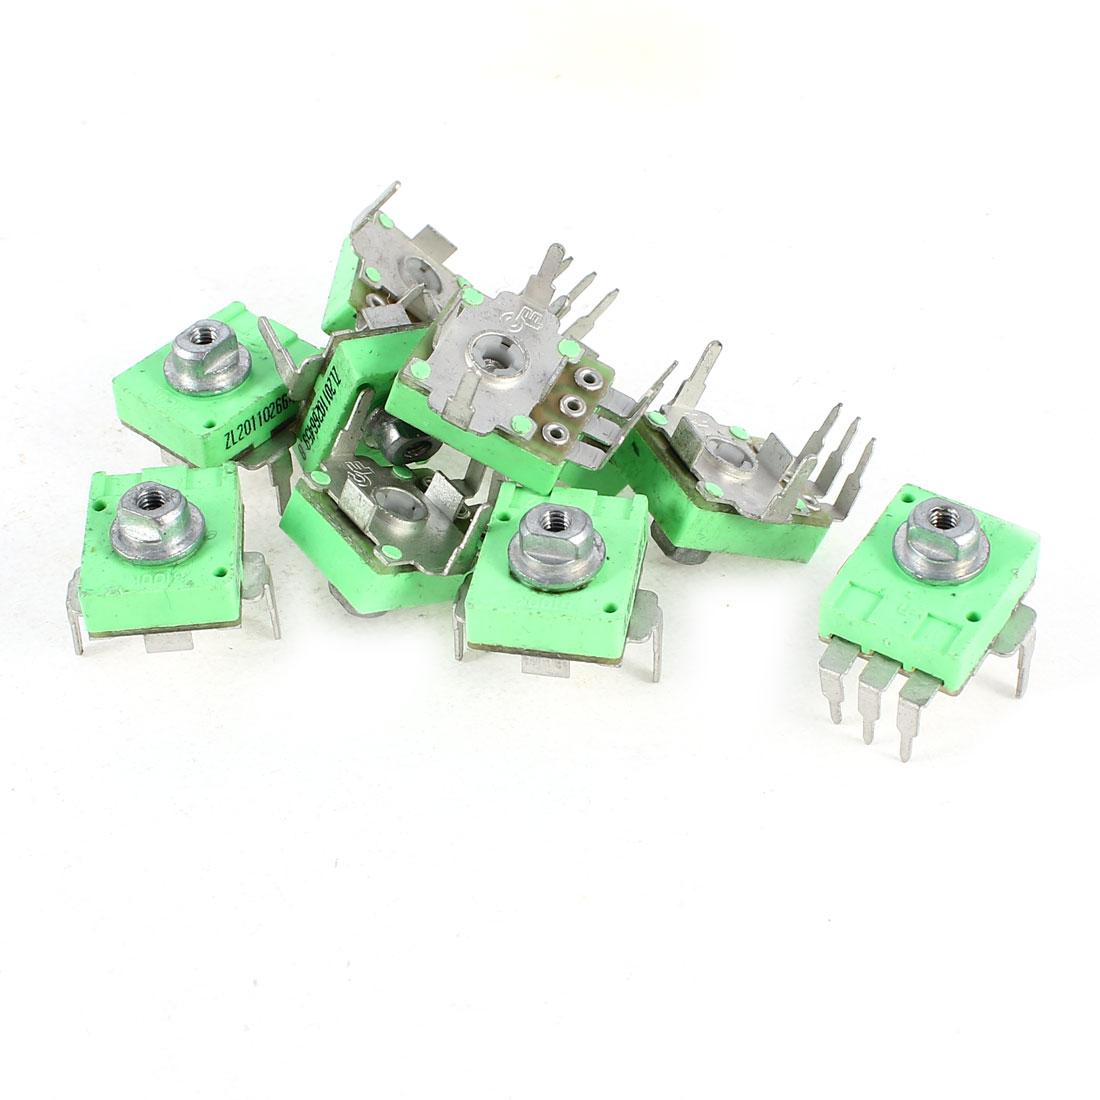 10 x Plastic Base 3 Terminals 100K Ohm PCB Mount Trimmer Potentiometer Resistors